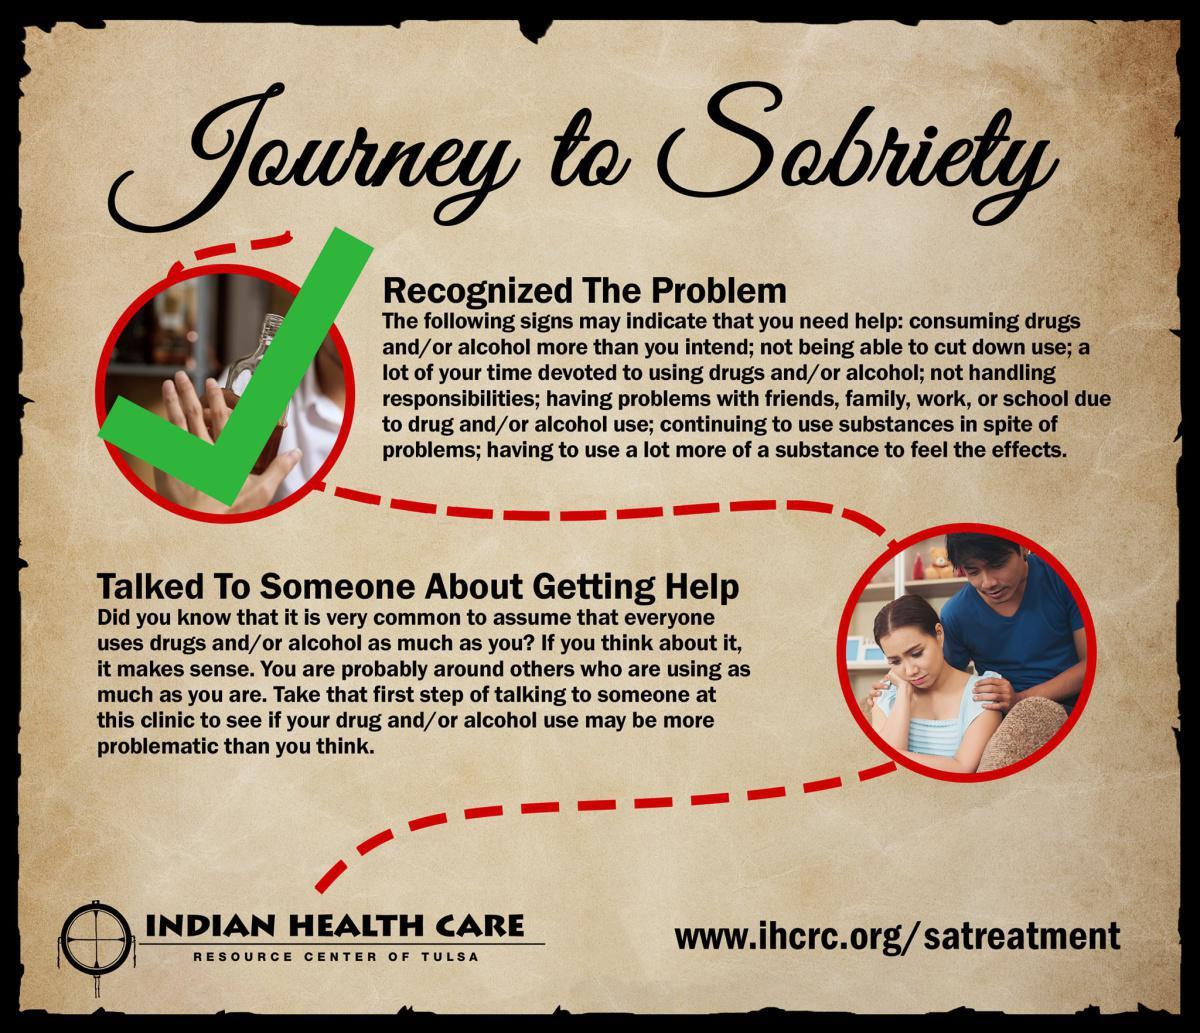 Journey to Sobriety